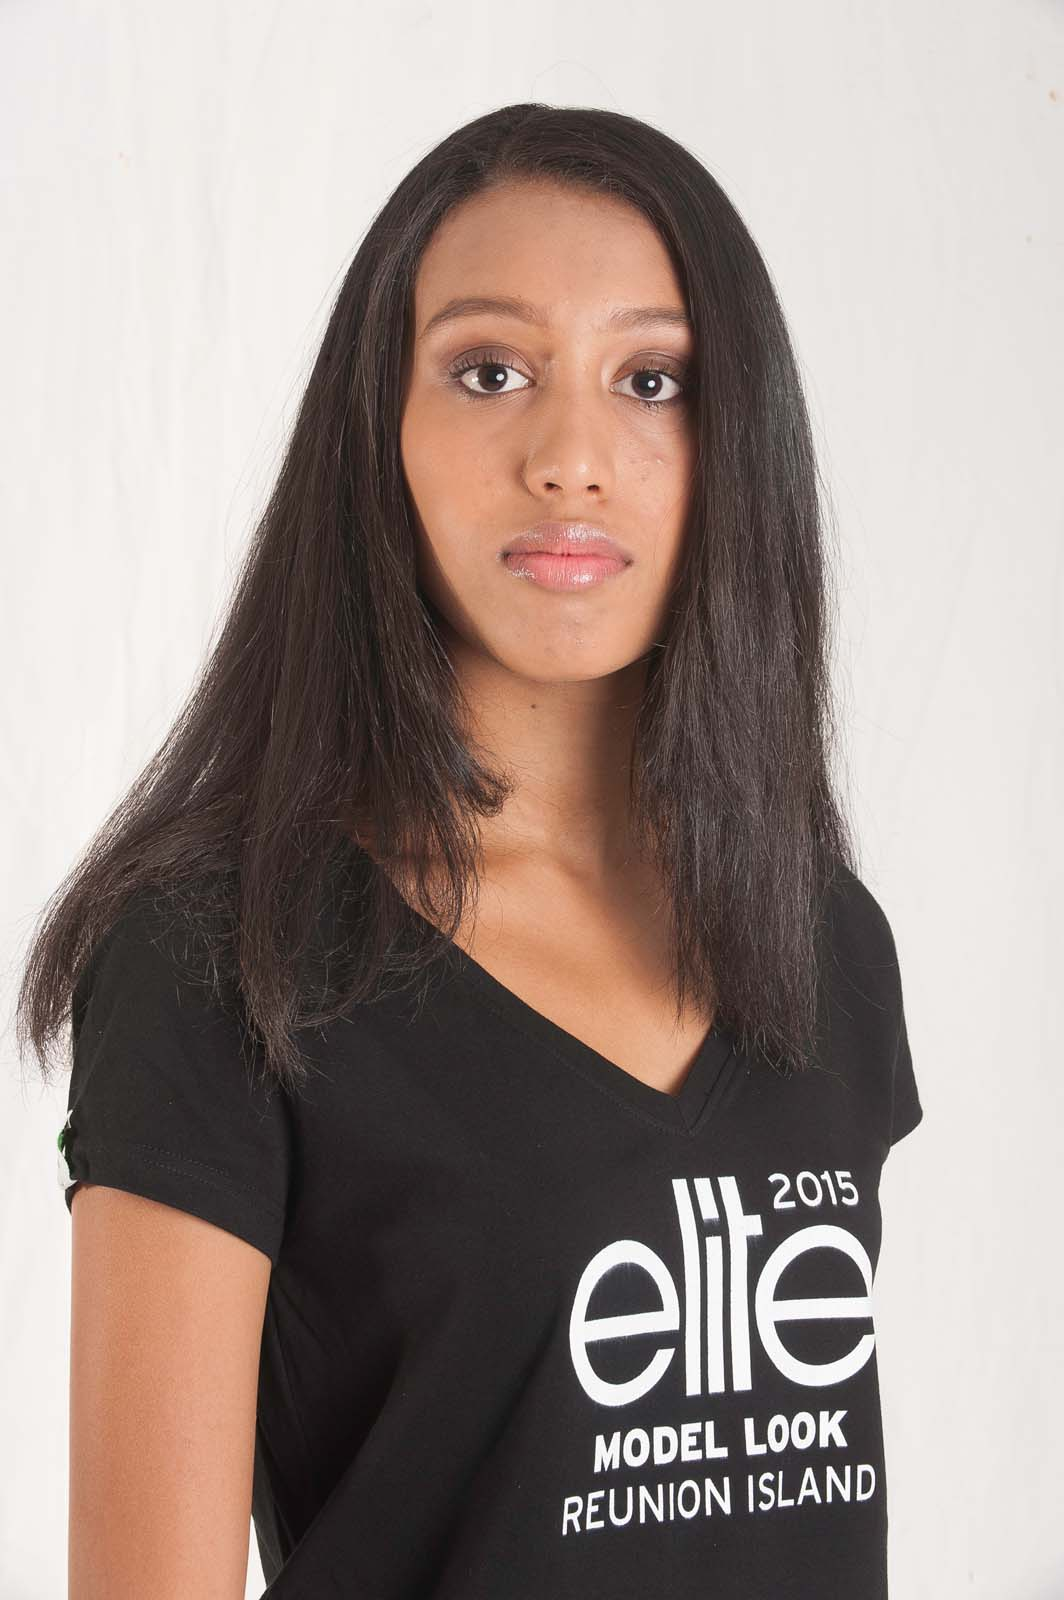 Kim Alizé - 15 ans - 178 cm